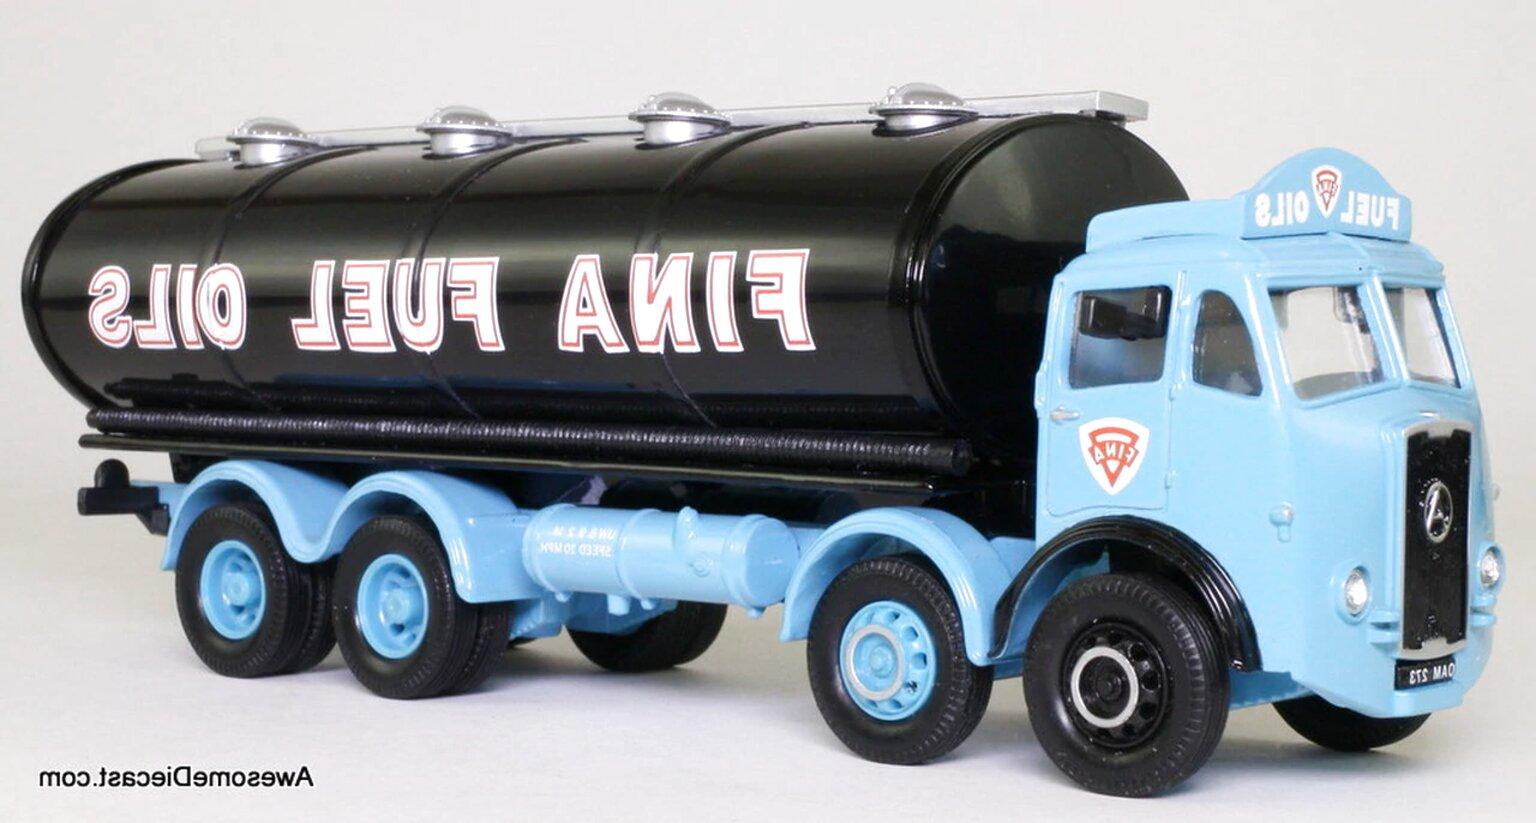 atkinson trucks 1 50 for sale